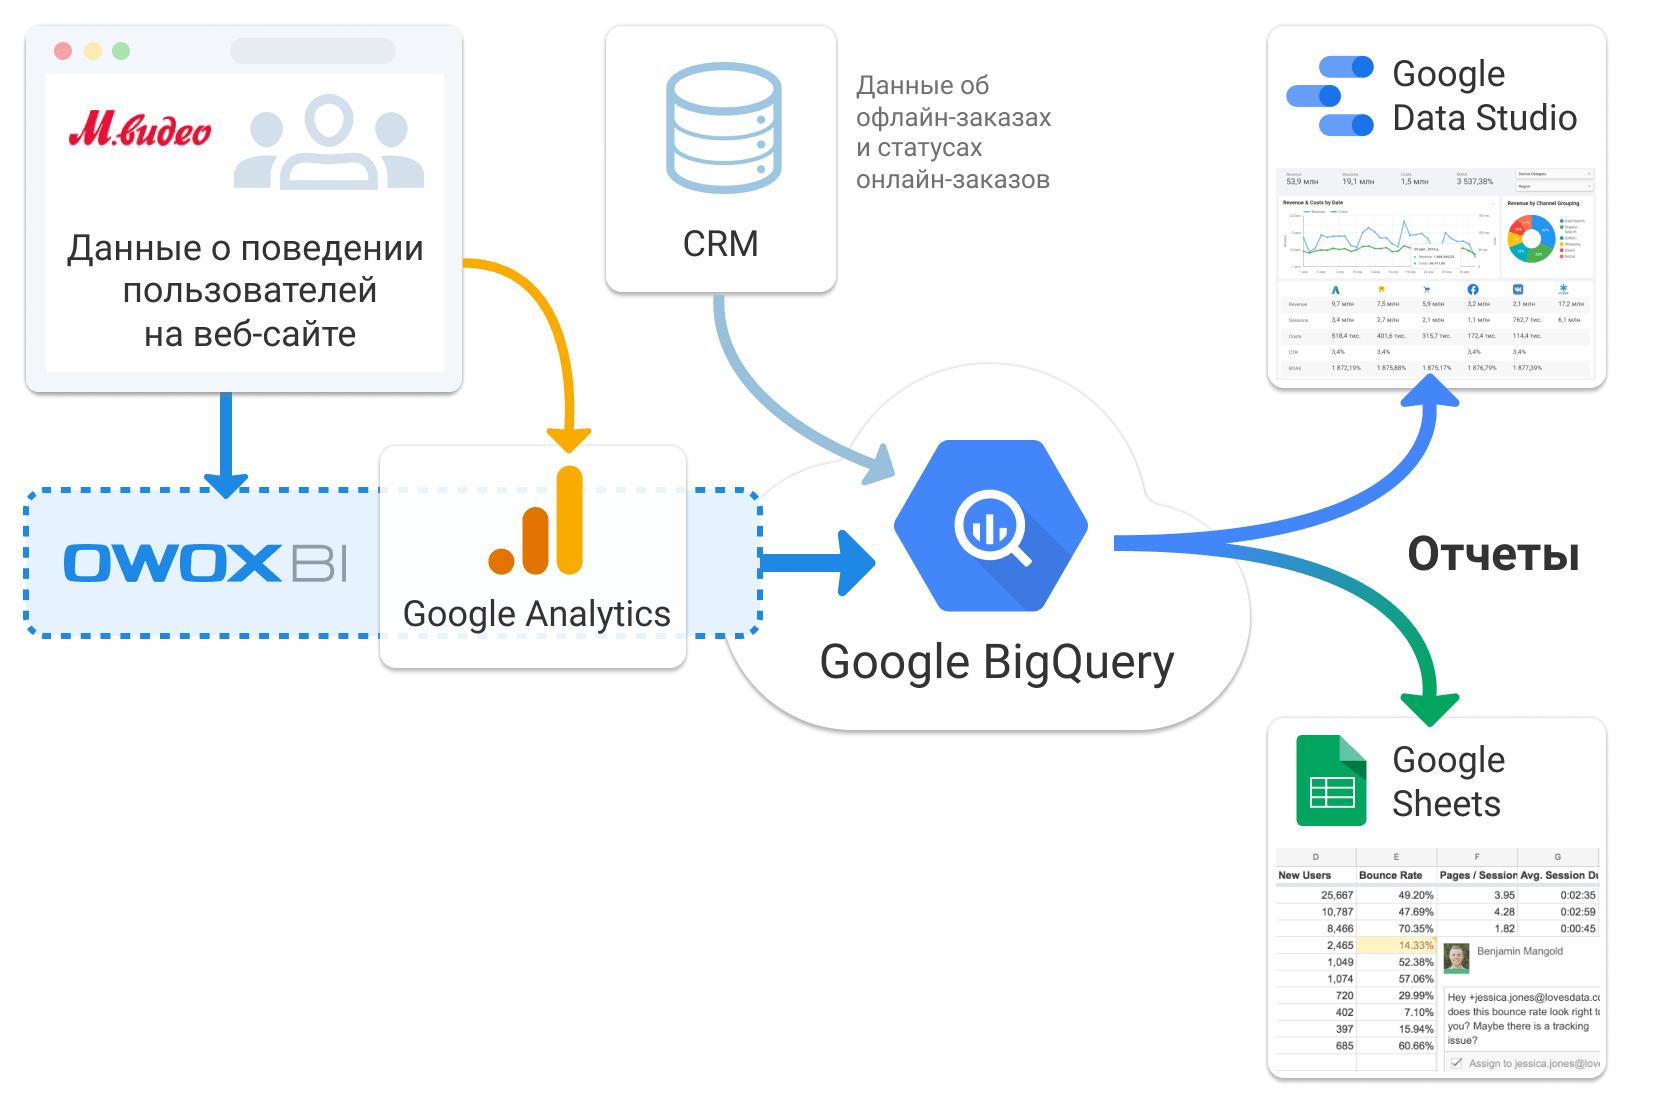 схема передачи данных для учета ROPO-продаж